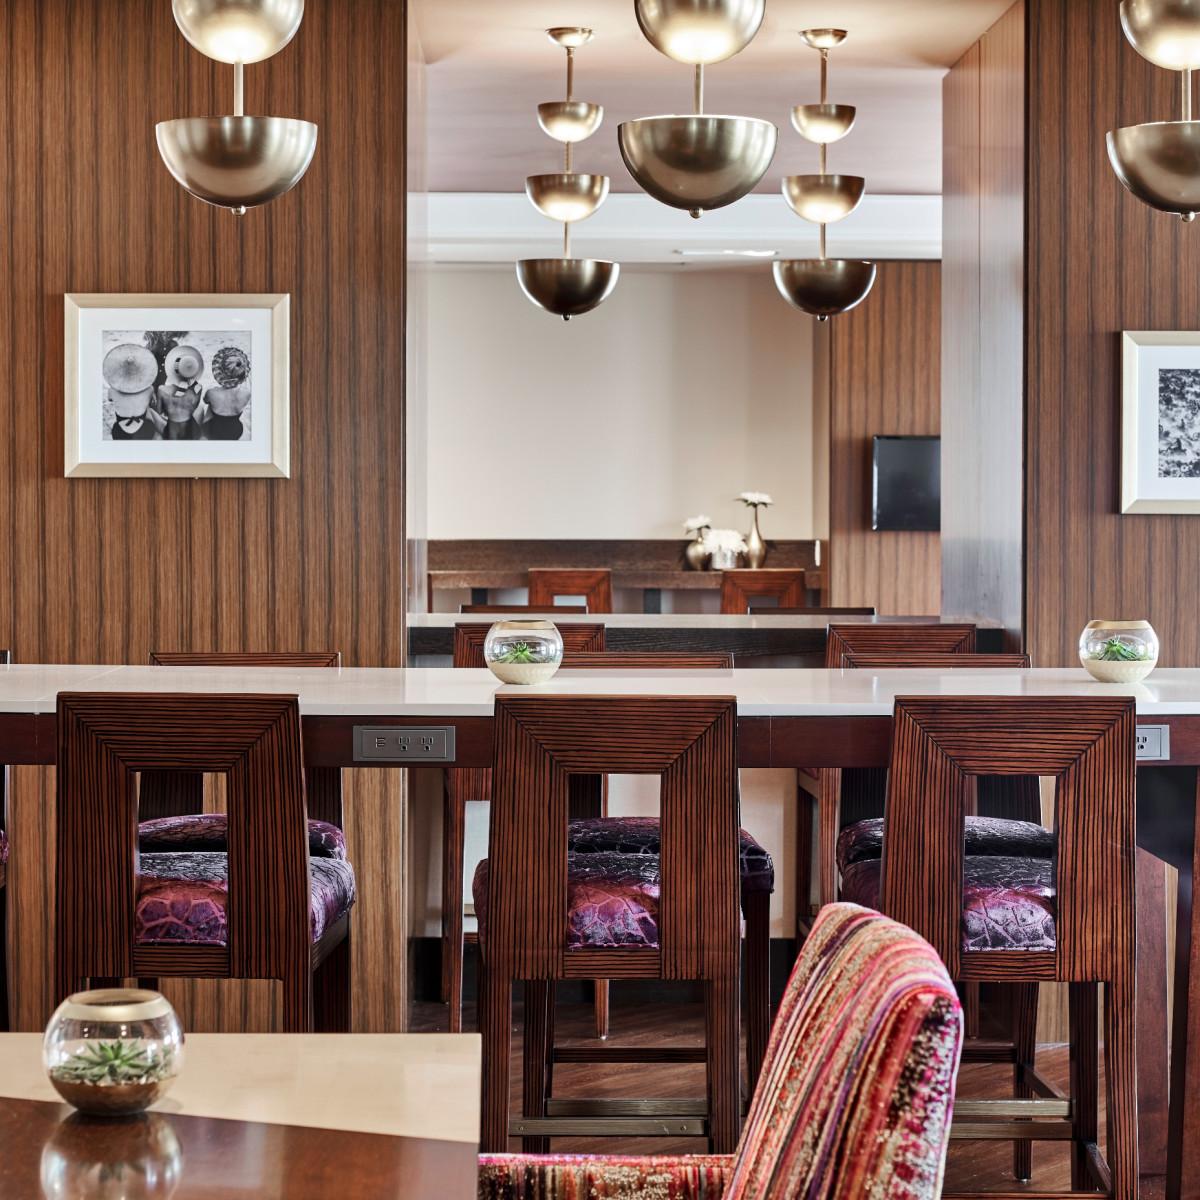 Fairmont Austin hotel